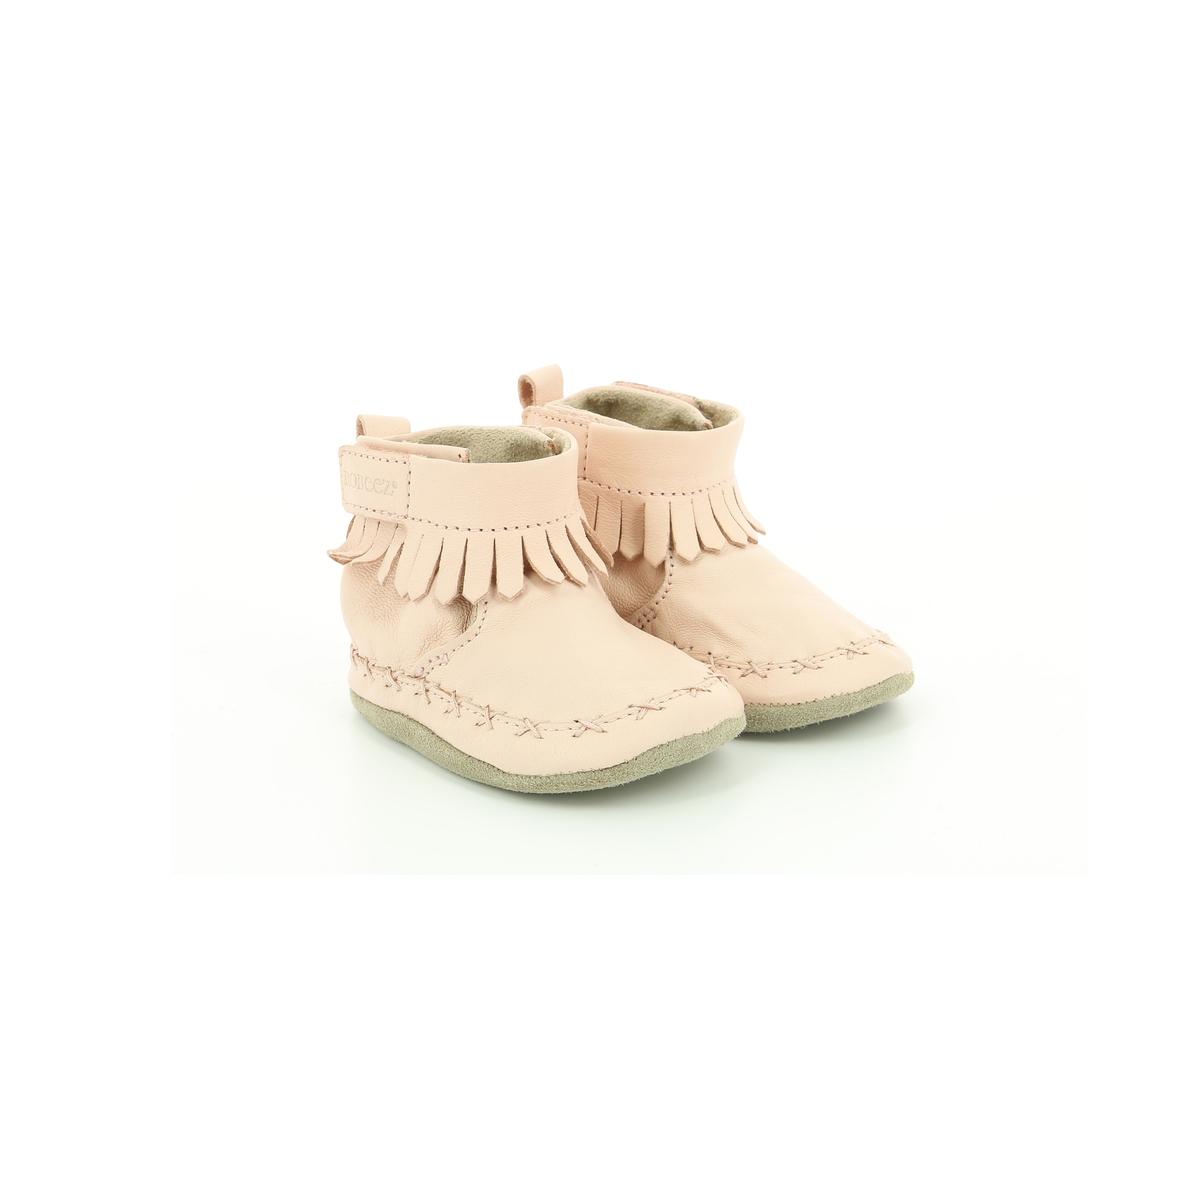 Туфли мягкие FUNKY SHOE cie square toe full borgues wingtips laceup black 100%genuine calf leather goodyear men shoe bespoke leather shoe handmade ox326